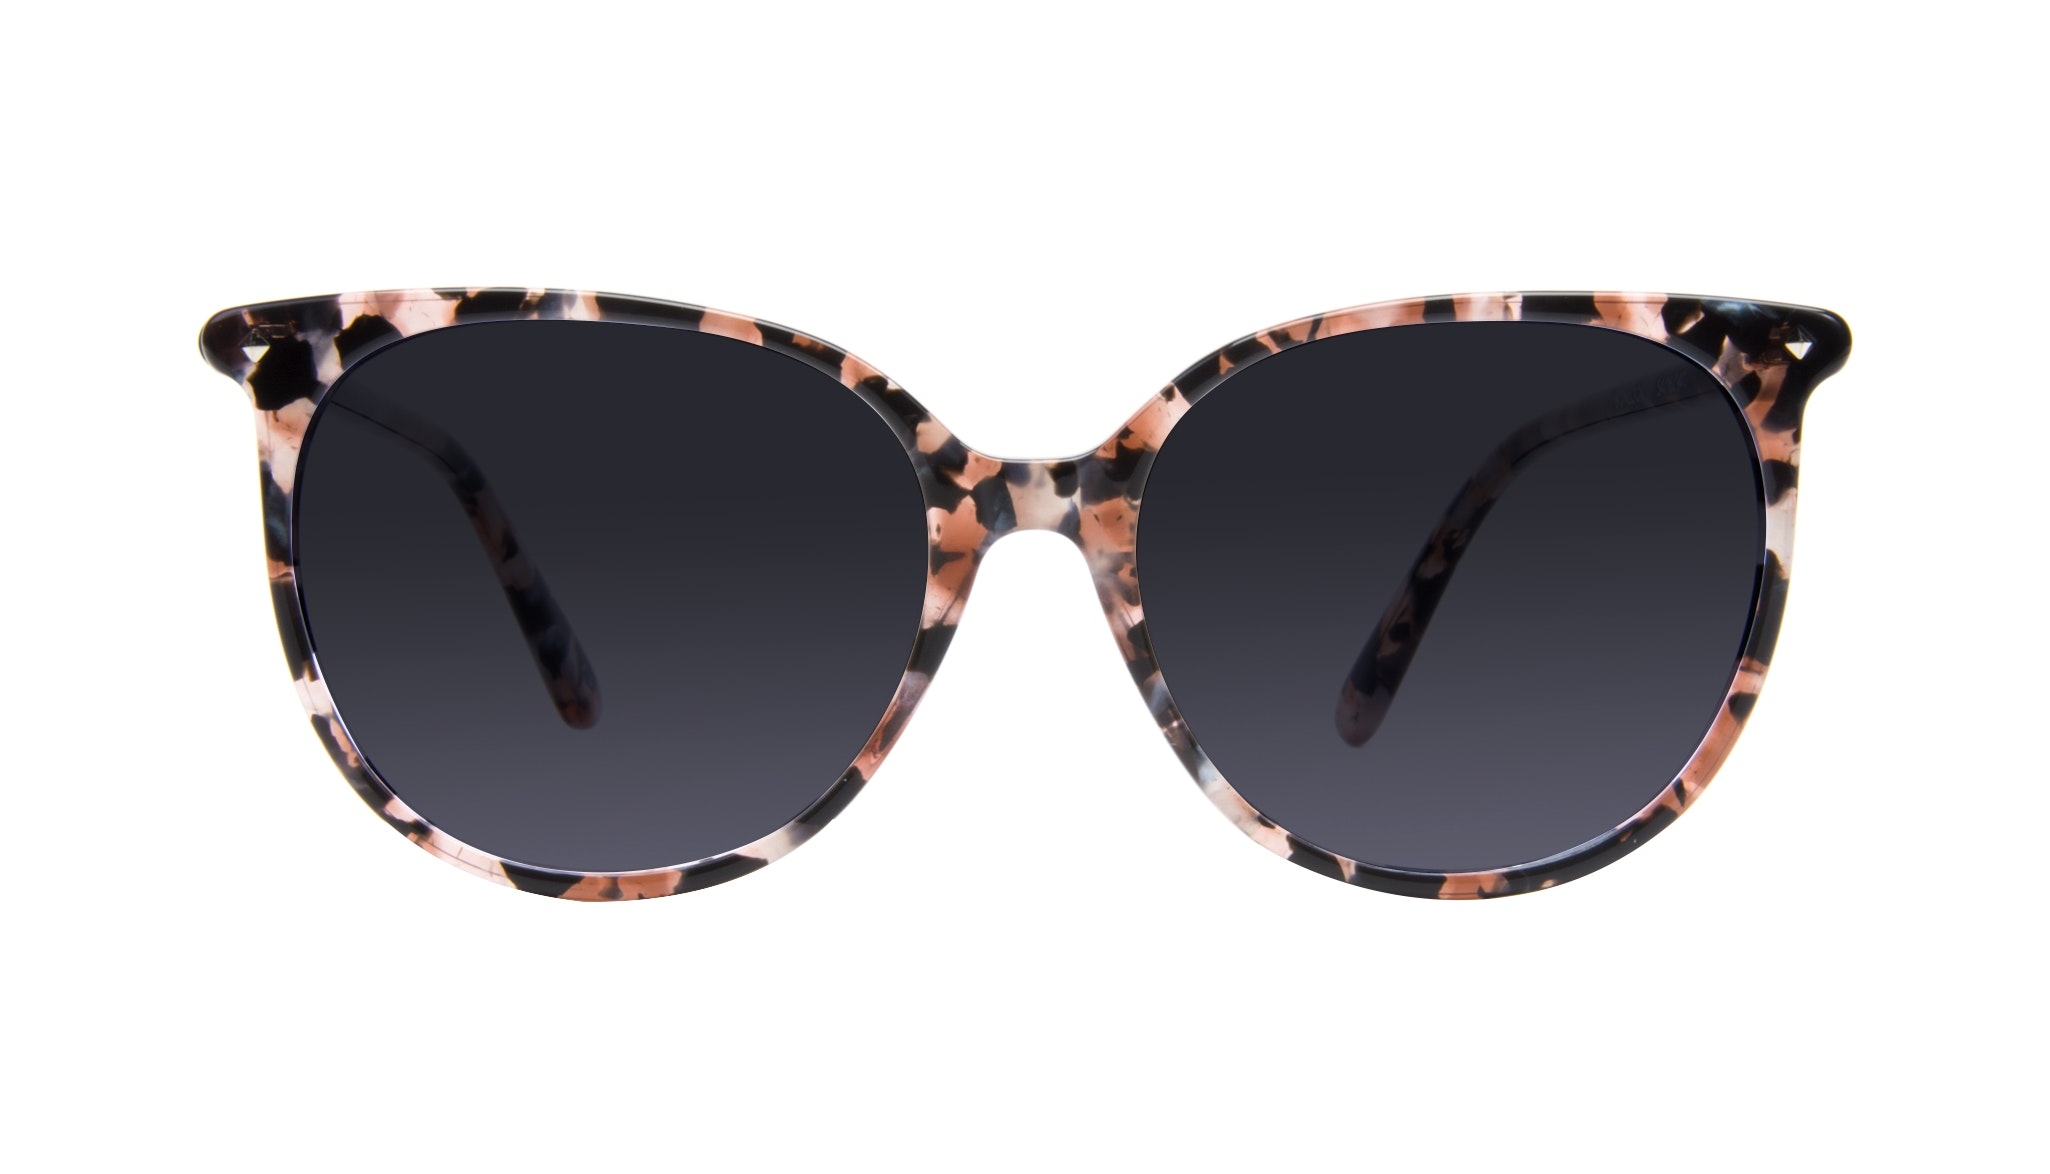 Affordable Fashion Glasses Cat Eye Square Sunglasses Women Area Pink Tortoise